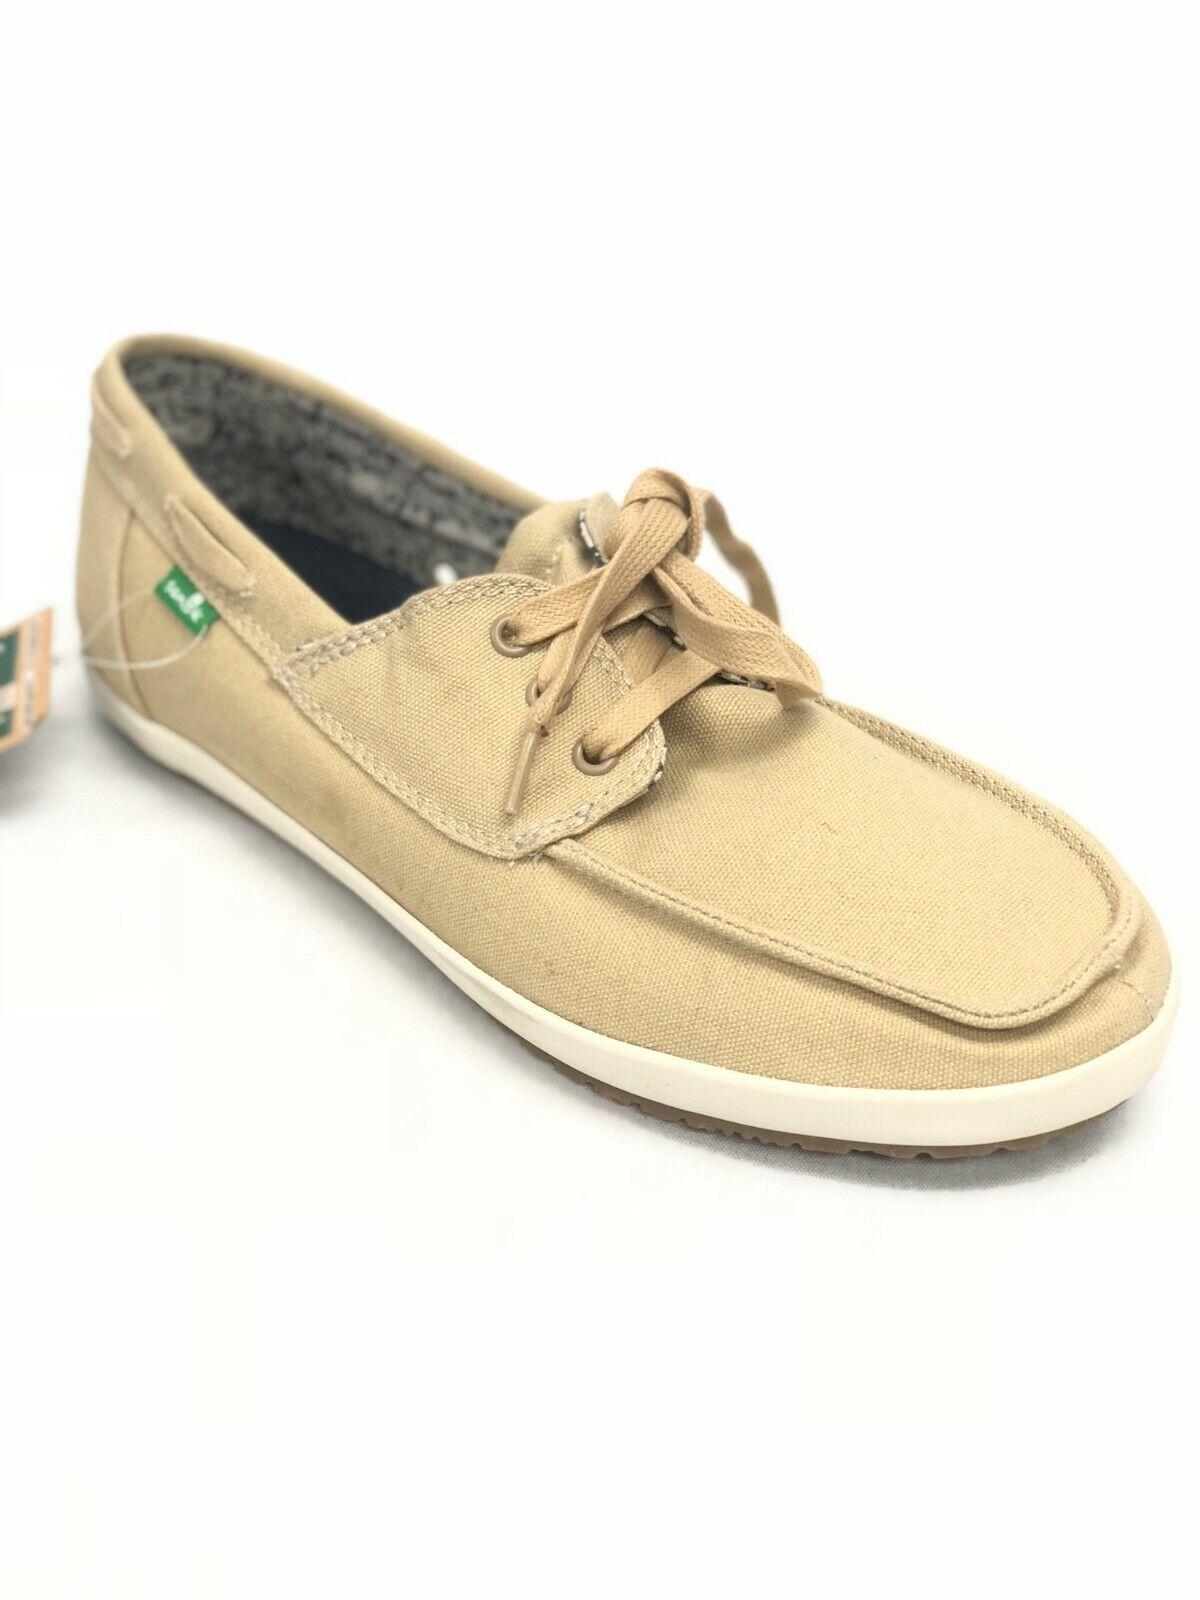 Men/'s Shoes Sanuk Admiral Lace Up Canvas Boat Shoes SMF10627 Black *New*